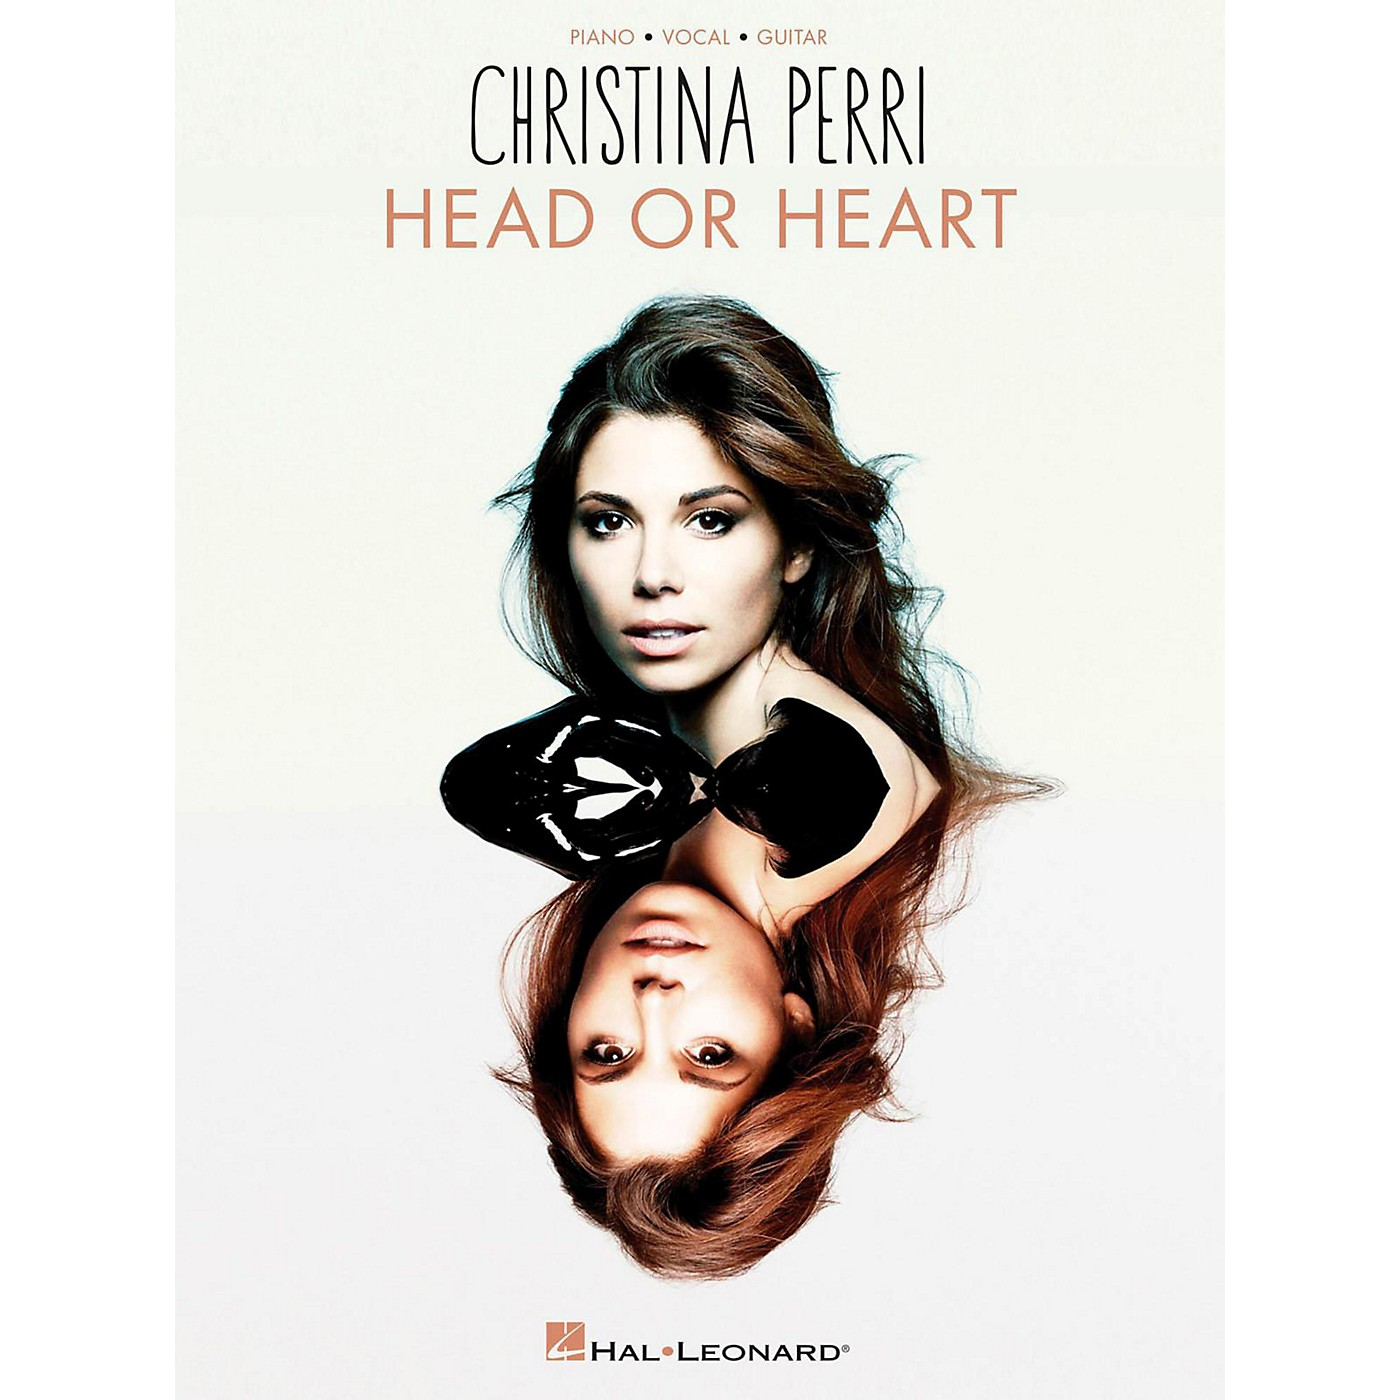 Hal Leonard Christina Perri - Head Or Heart for Piano/Vocal/Guitar thumbnail